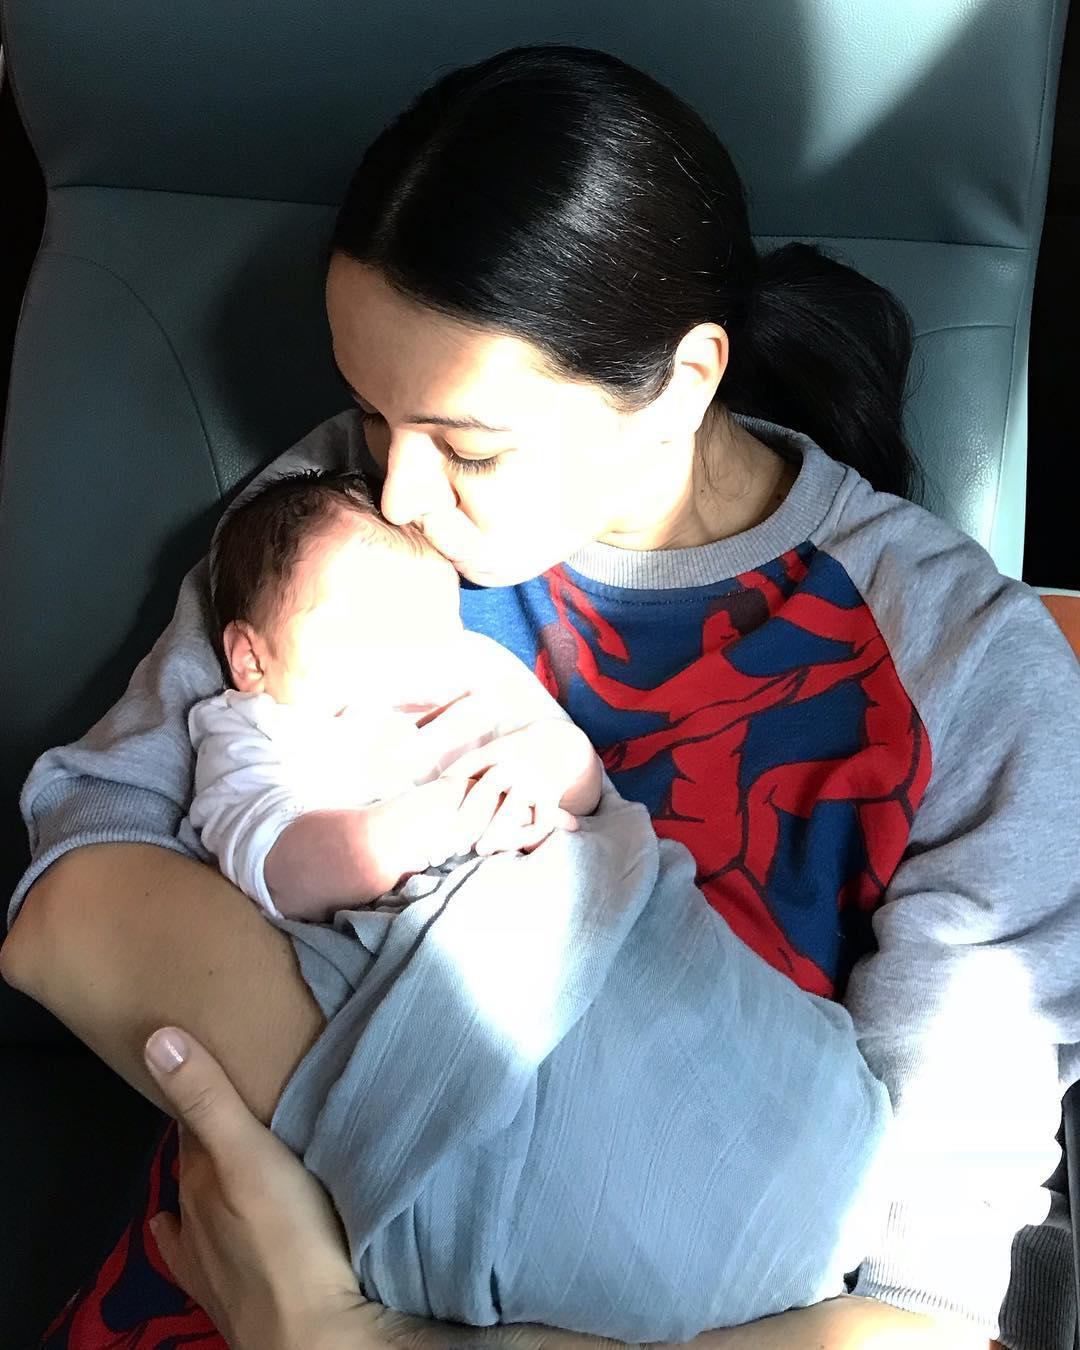 41-летняя прима-балерина Мариинки Диана Вишнева родила сына